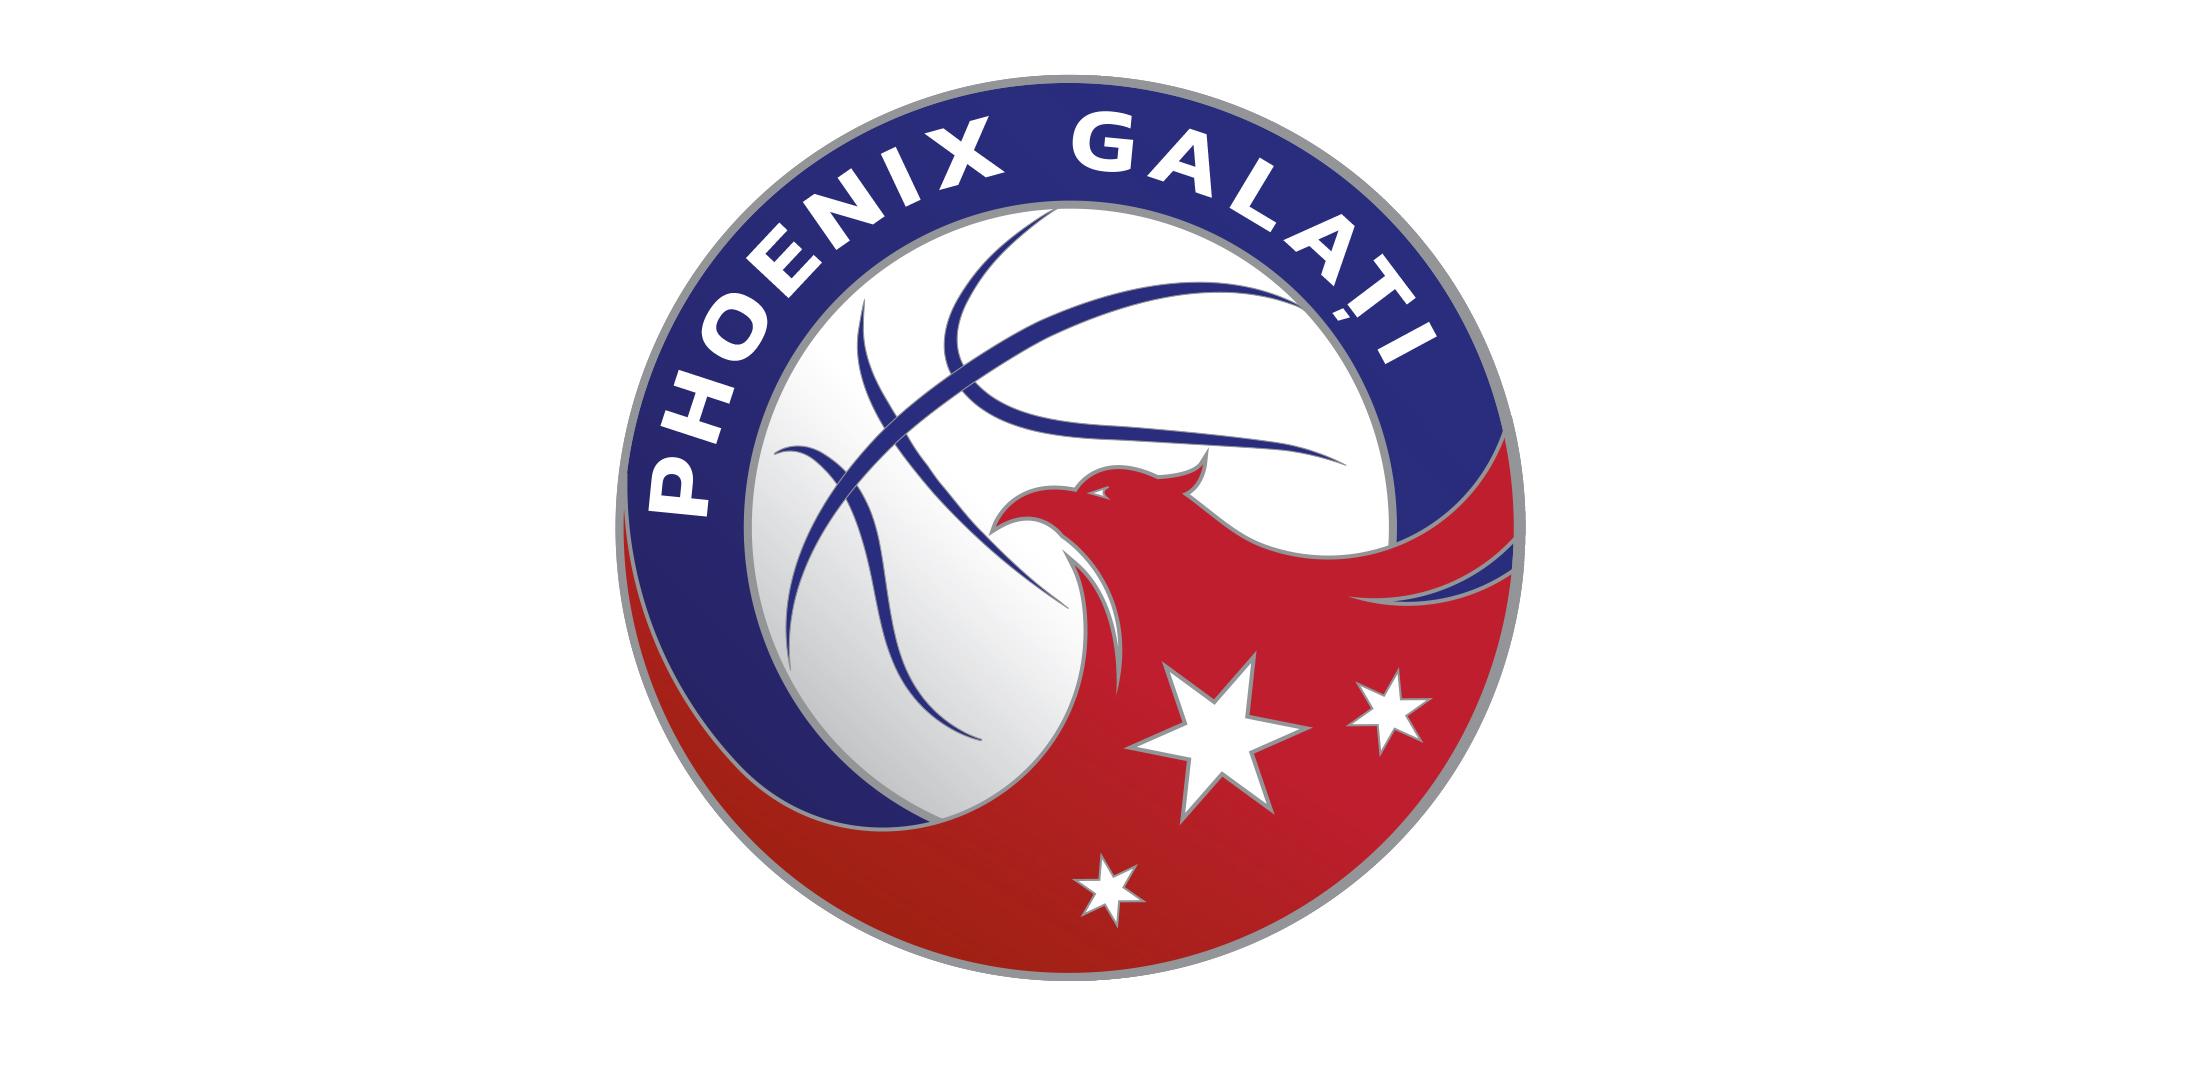 Phoenix Galati